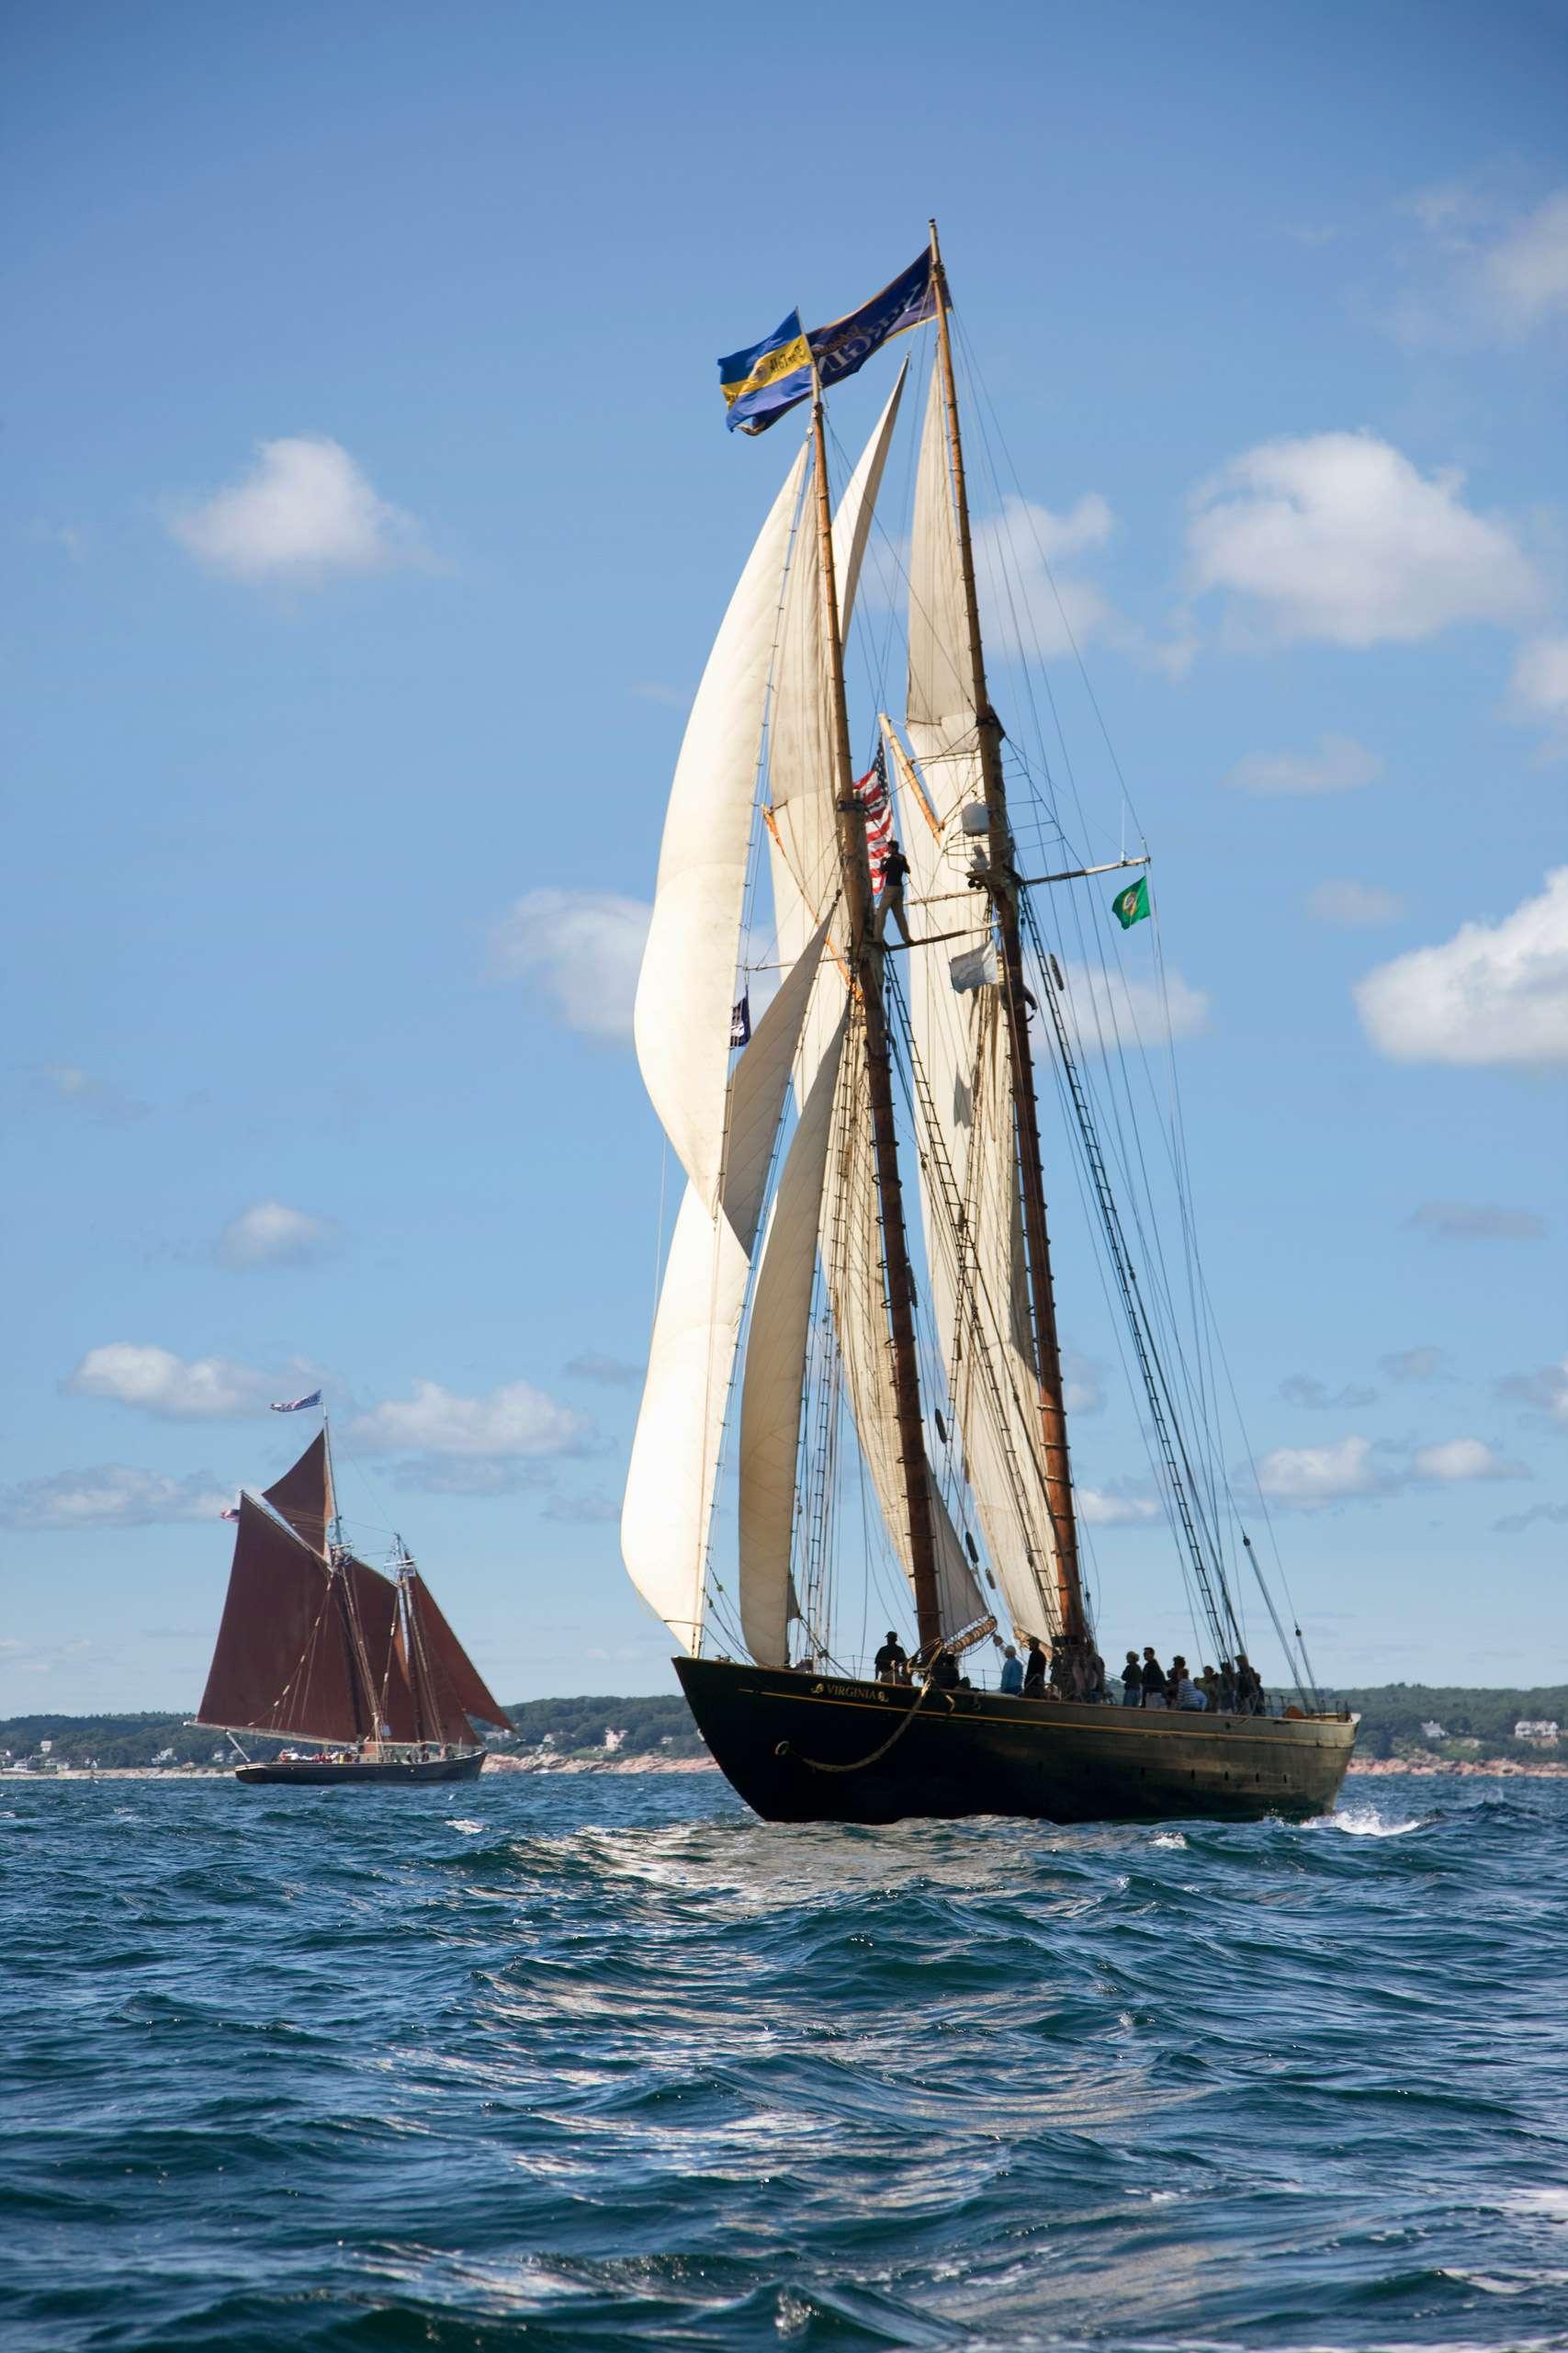 PORTFOLIO - Sailing - Windjammers #19  PCG459